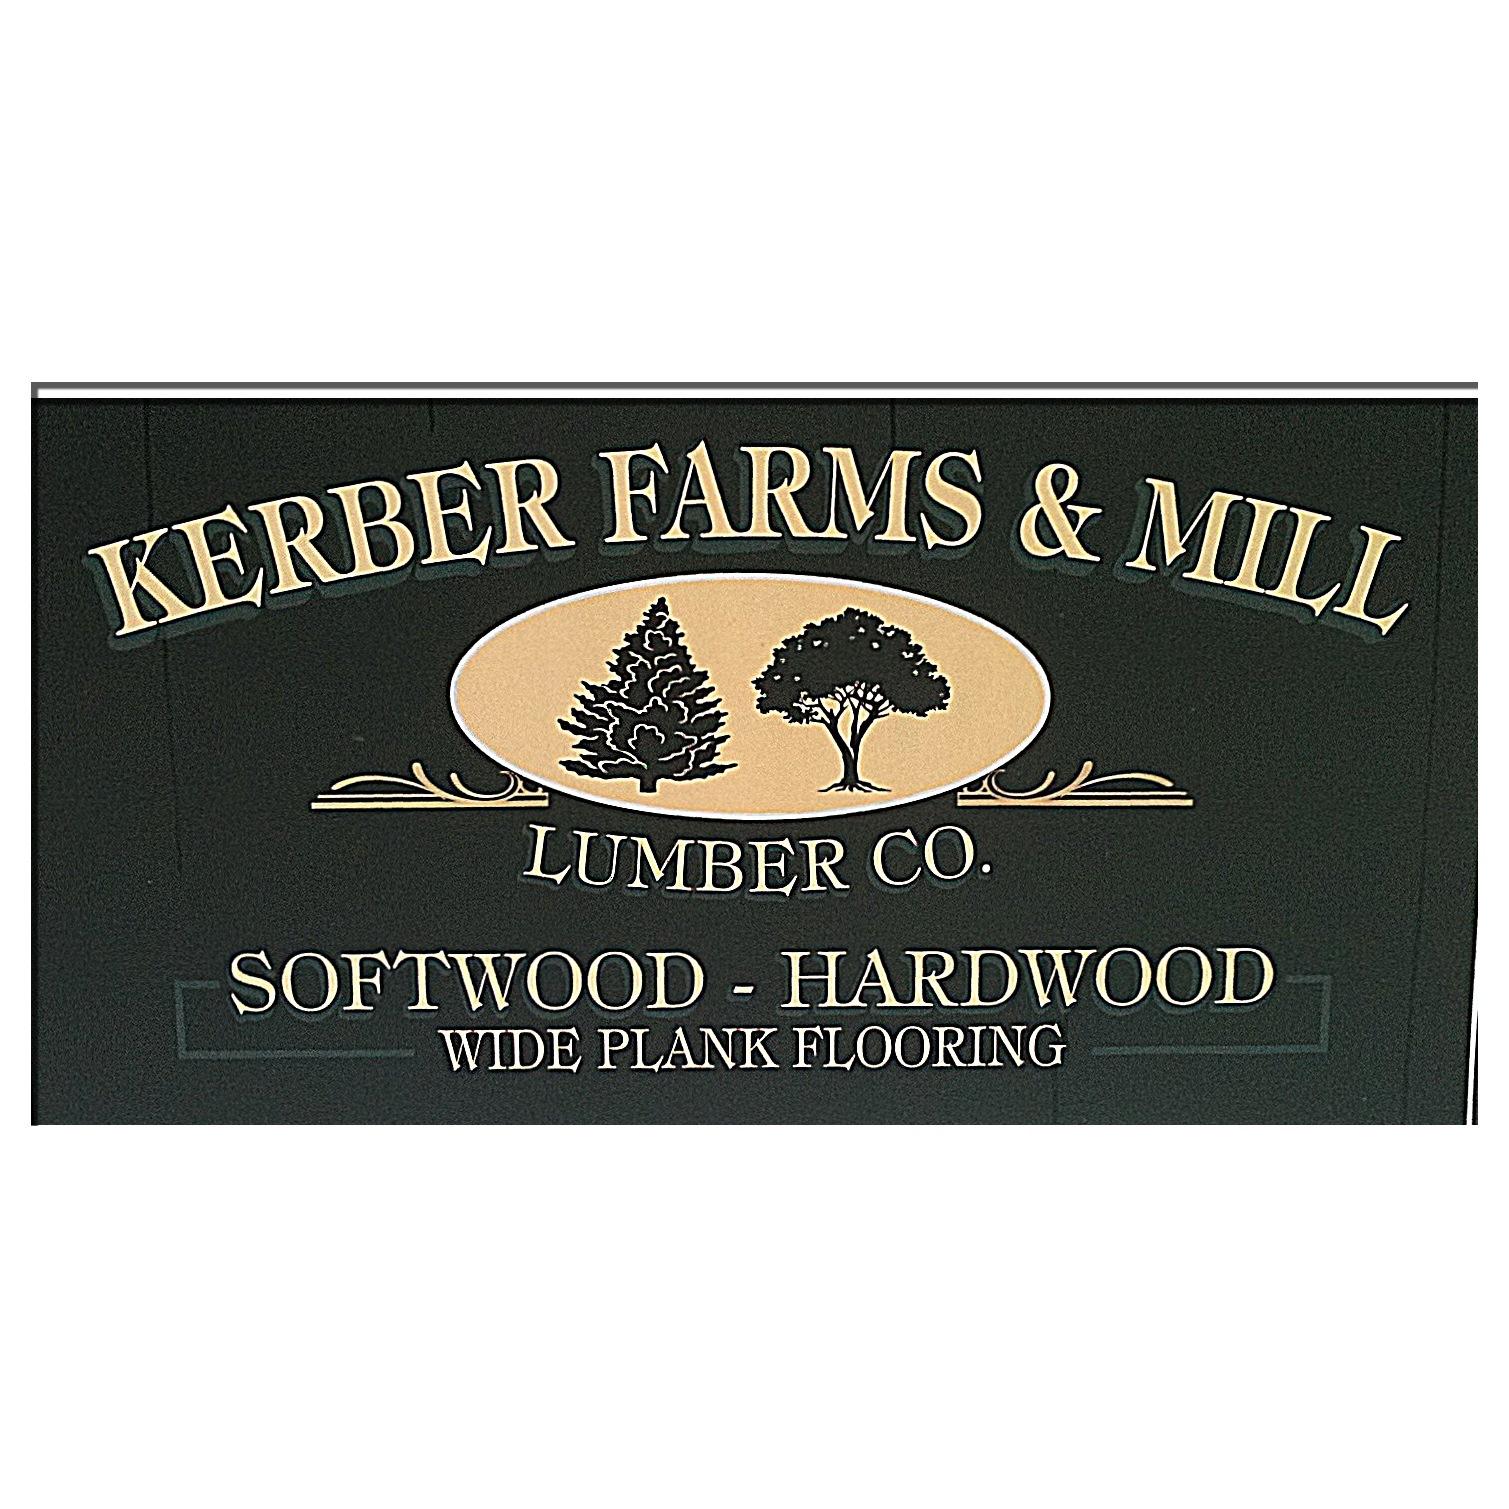 Kerber Farms Lumber Company image 4